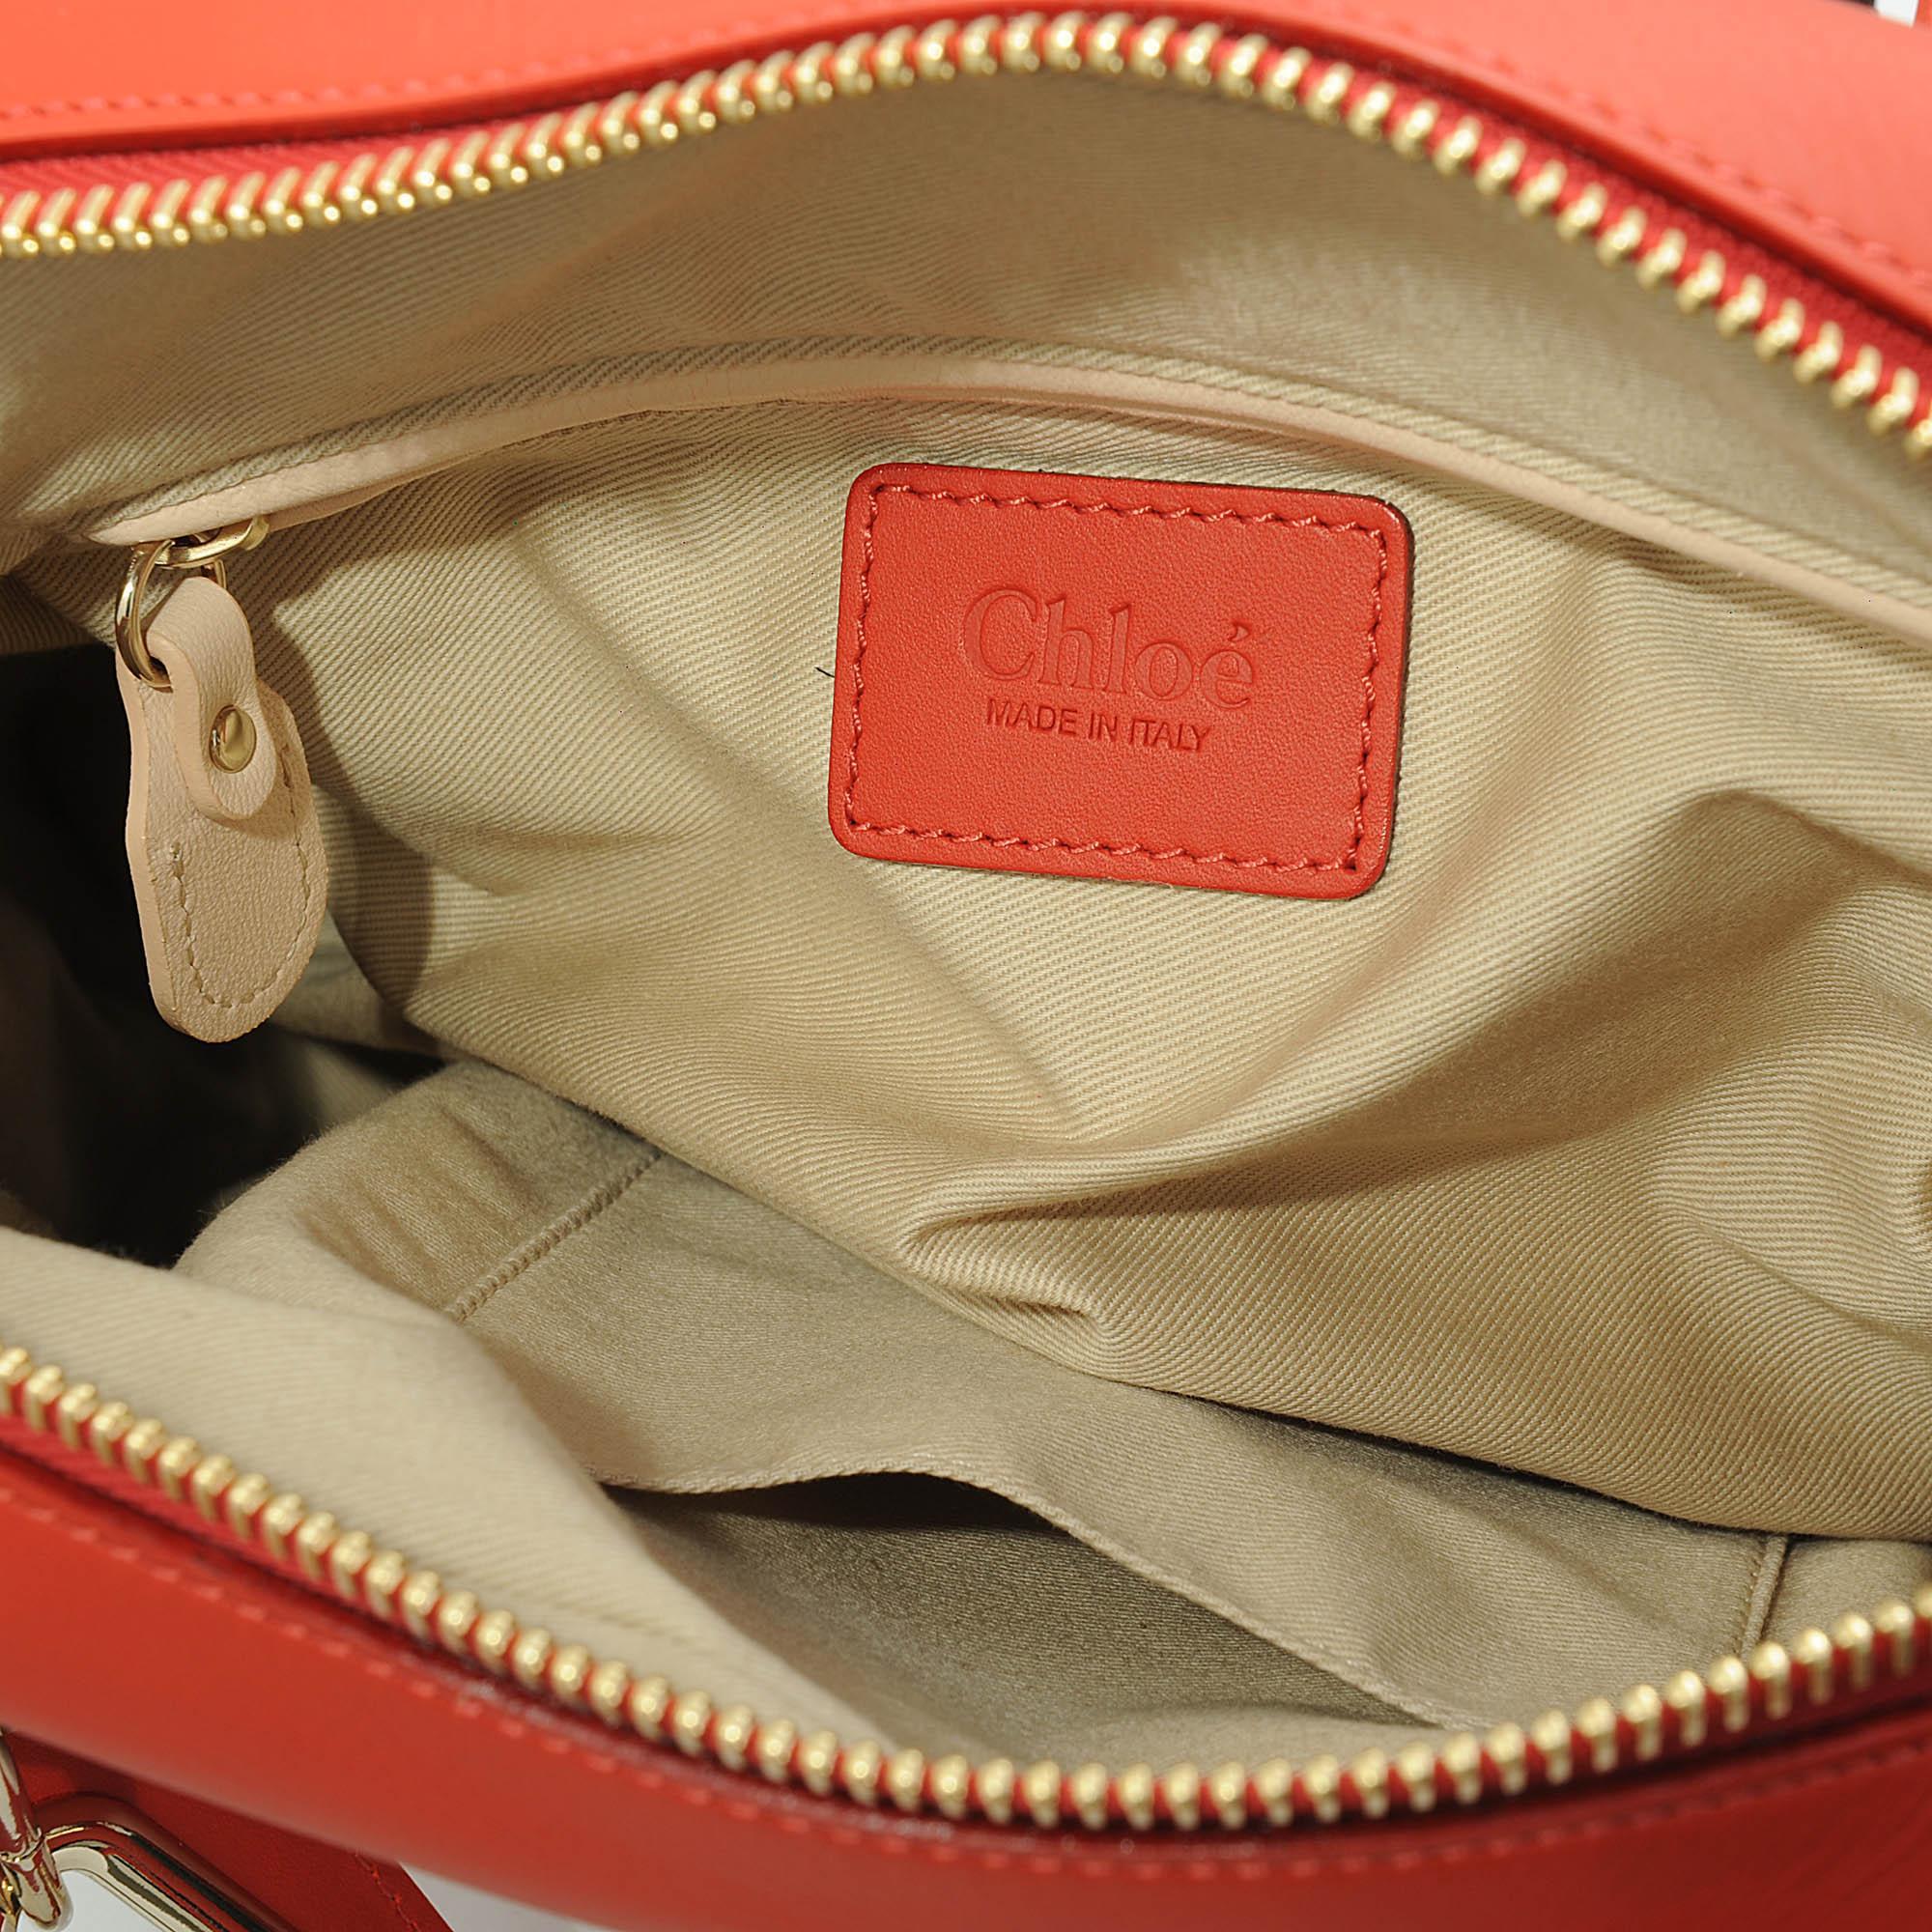 Chlo¨¦ Medium Paraty Metallic Bag in Red | Lyst